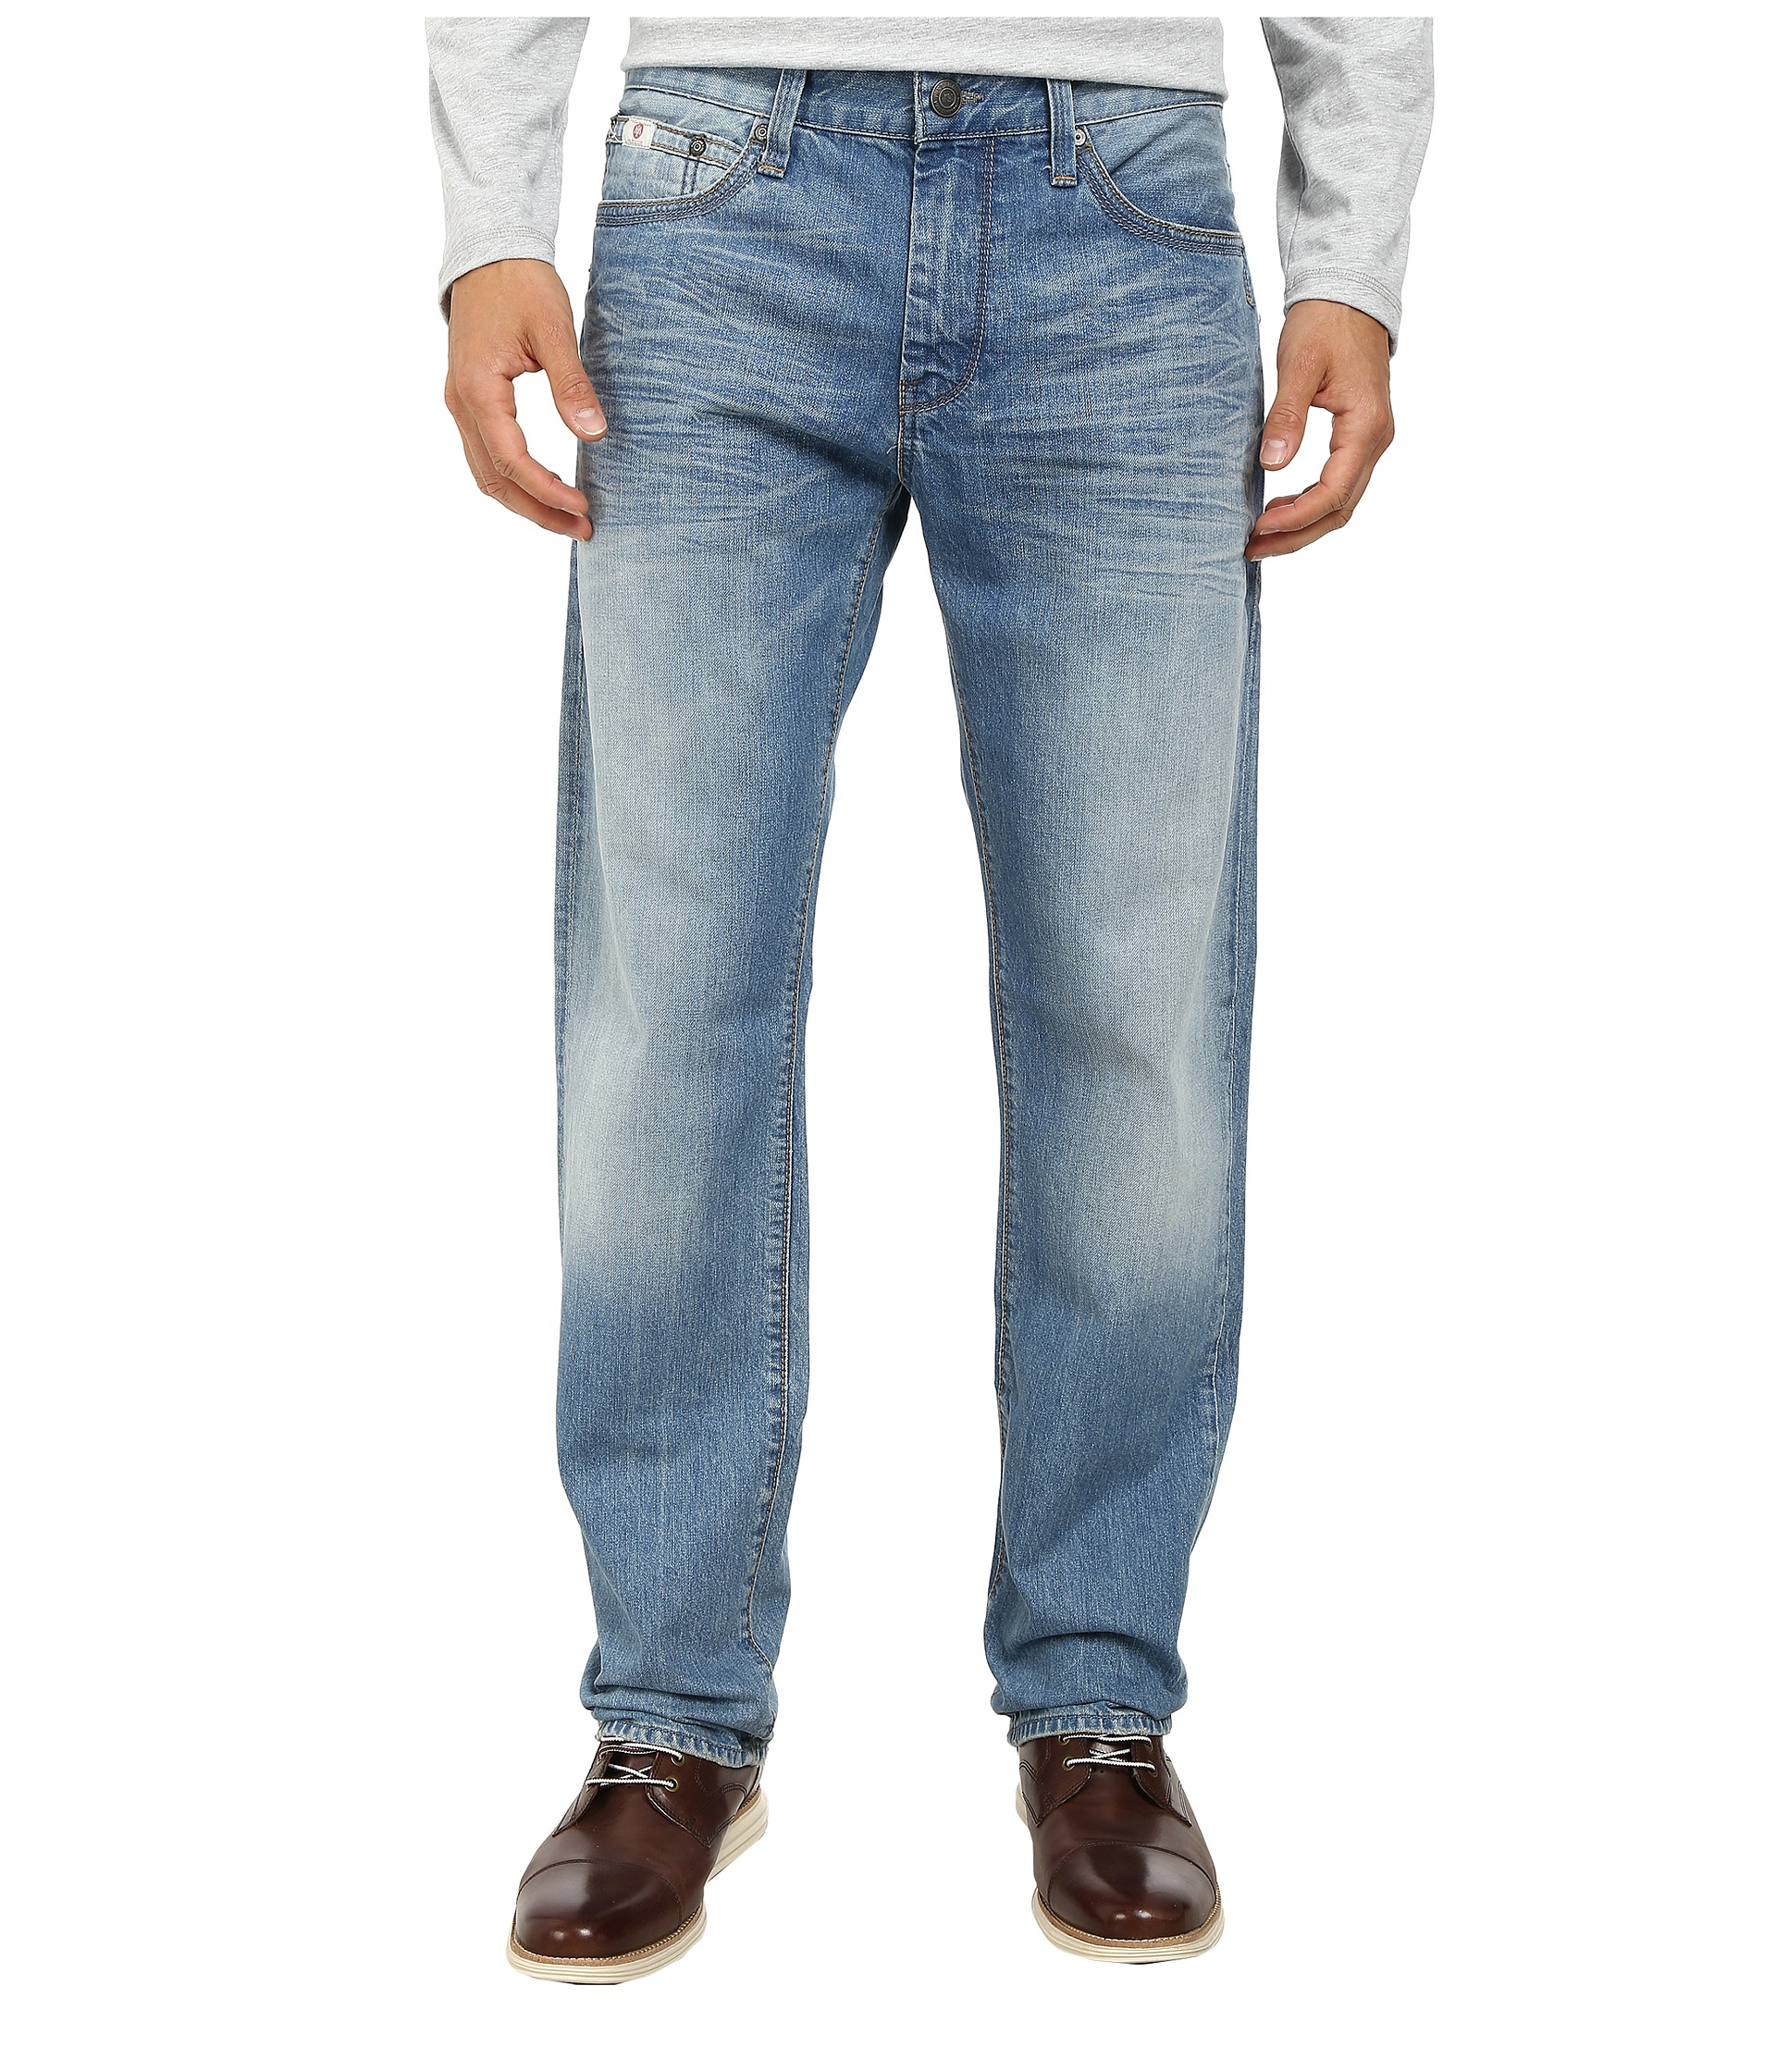 26 X 30 Mens Jeans